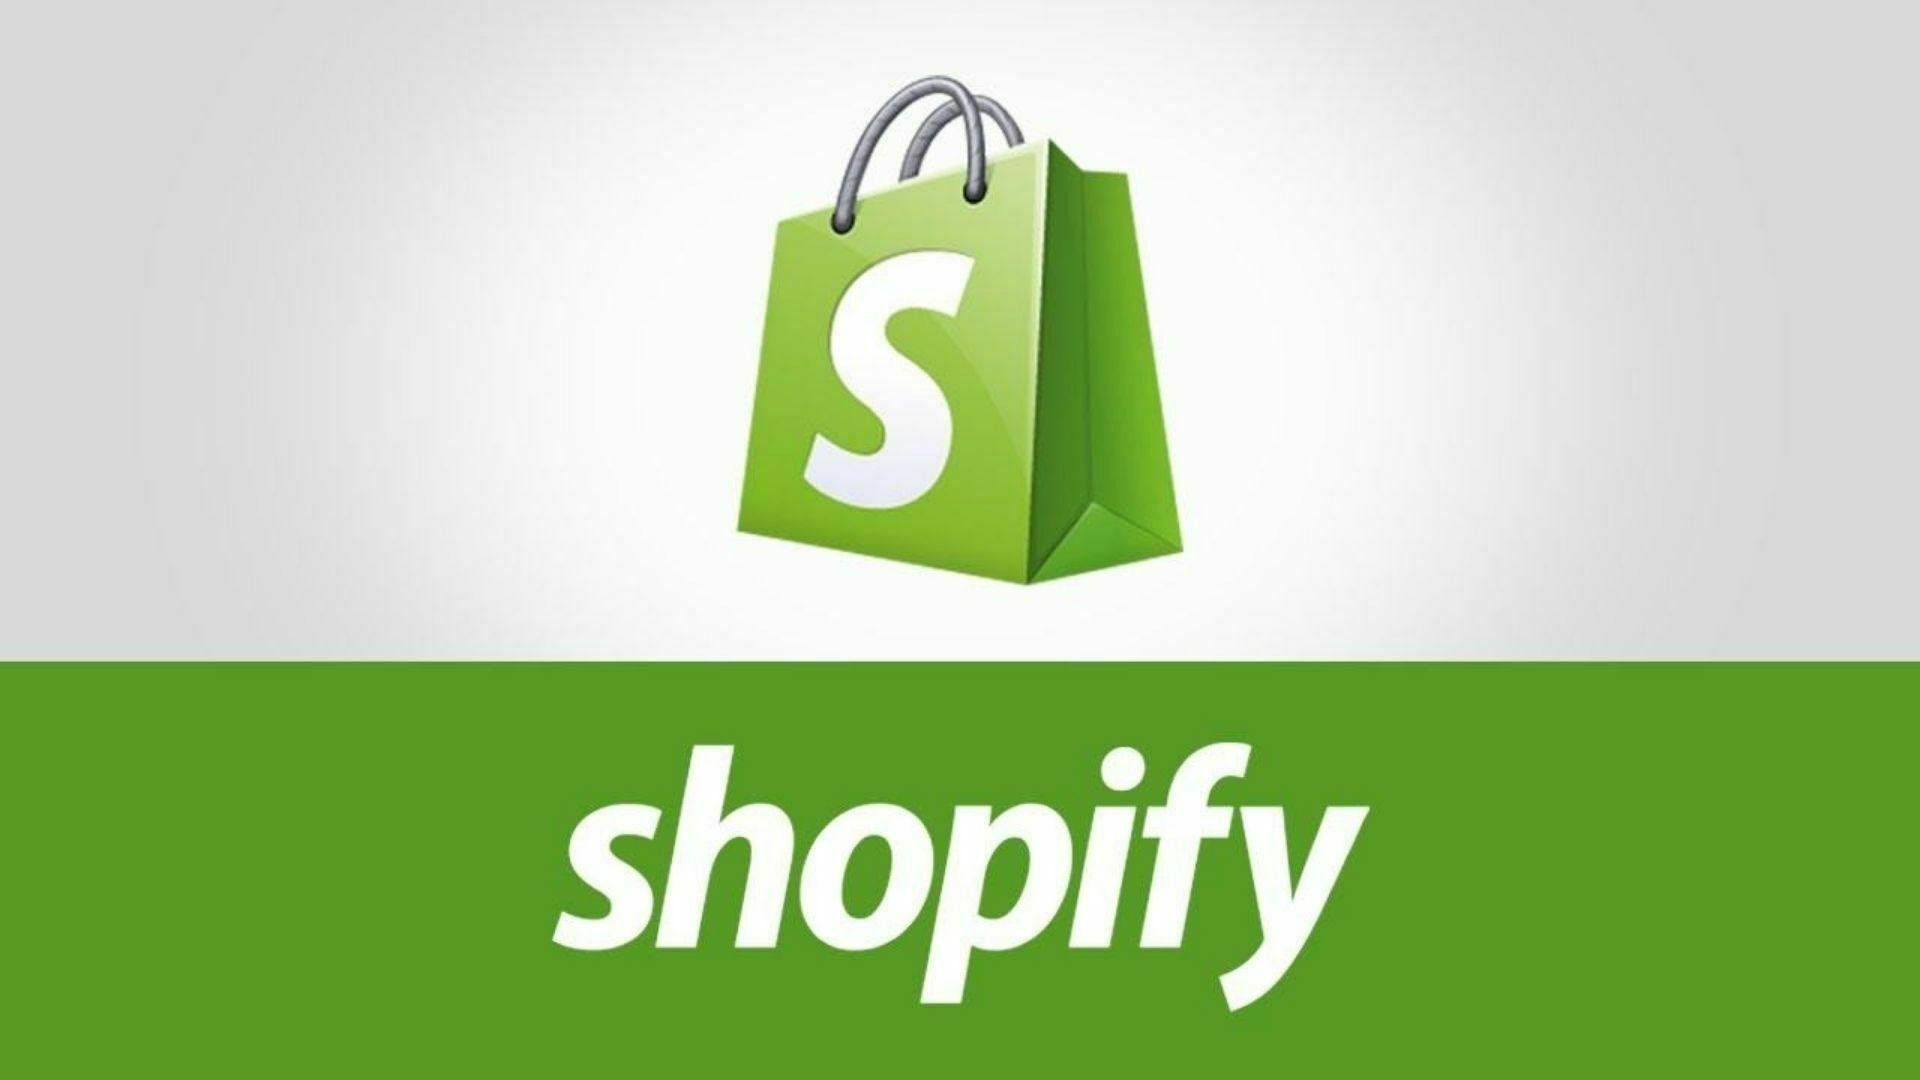 Shopify supports O2O